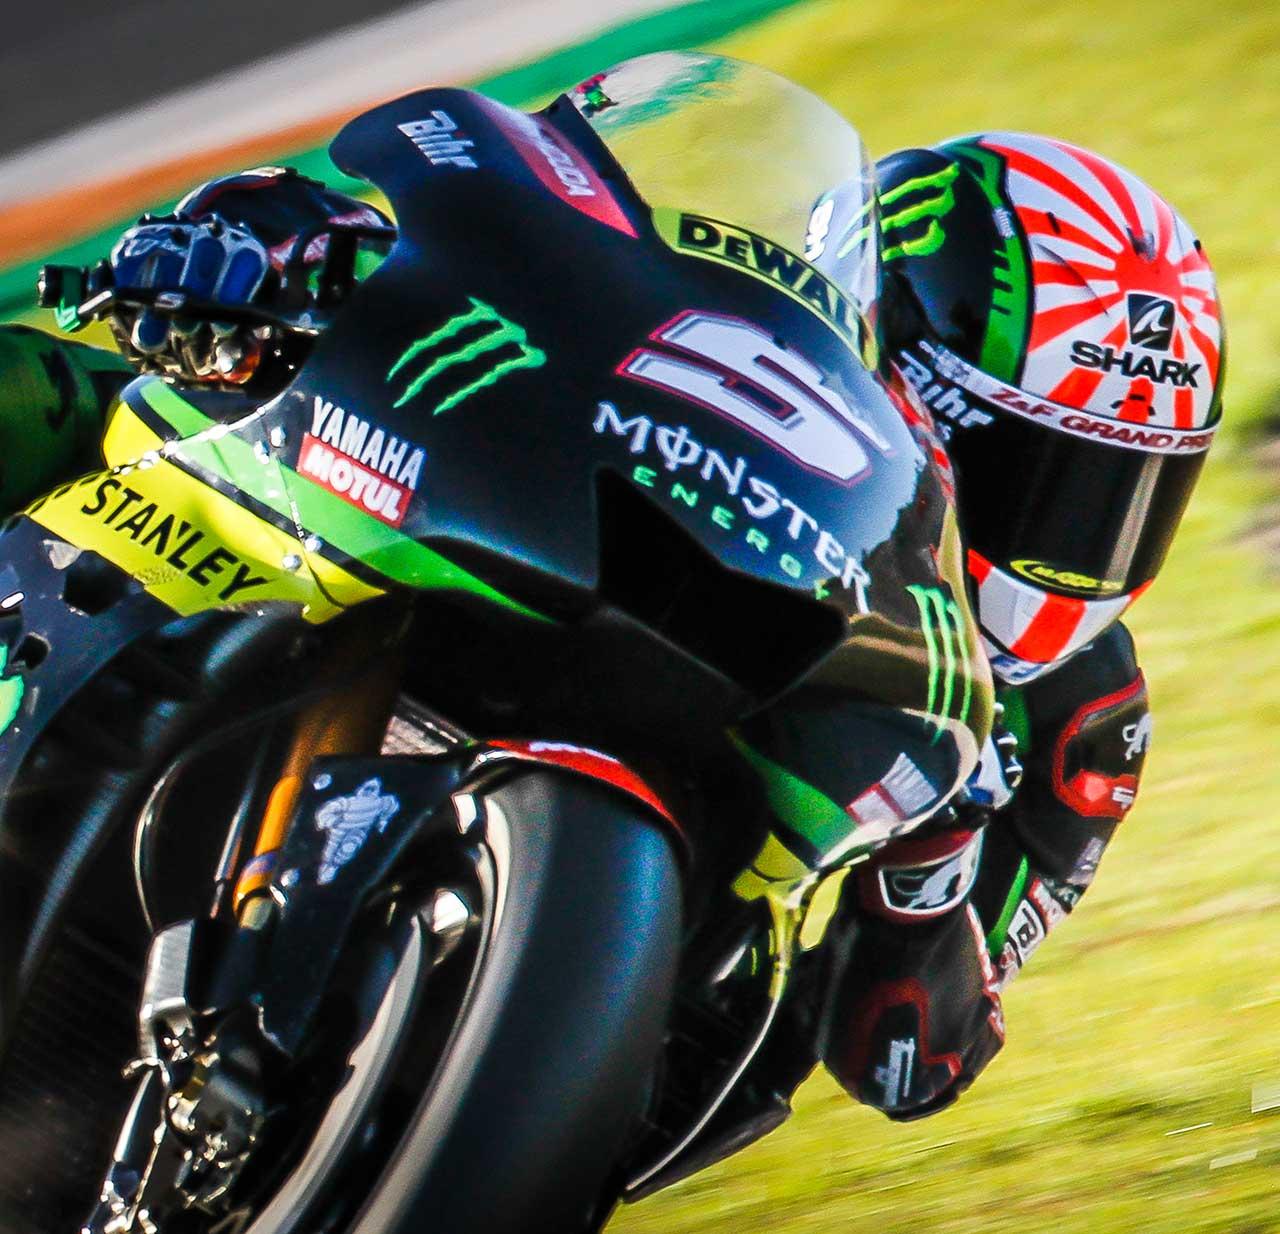 Motogp 2018: Maverick Vinales Tops First Day Of 2018 MotoGP Testing